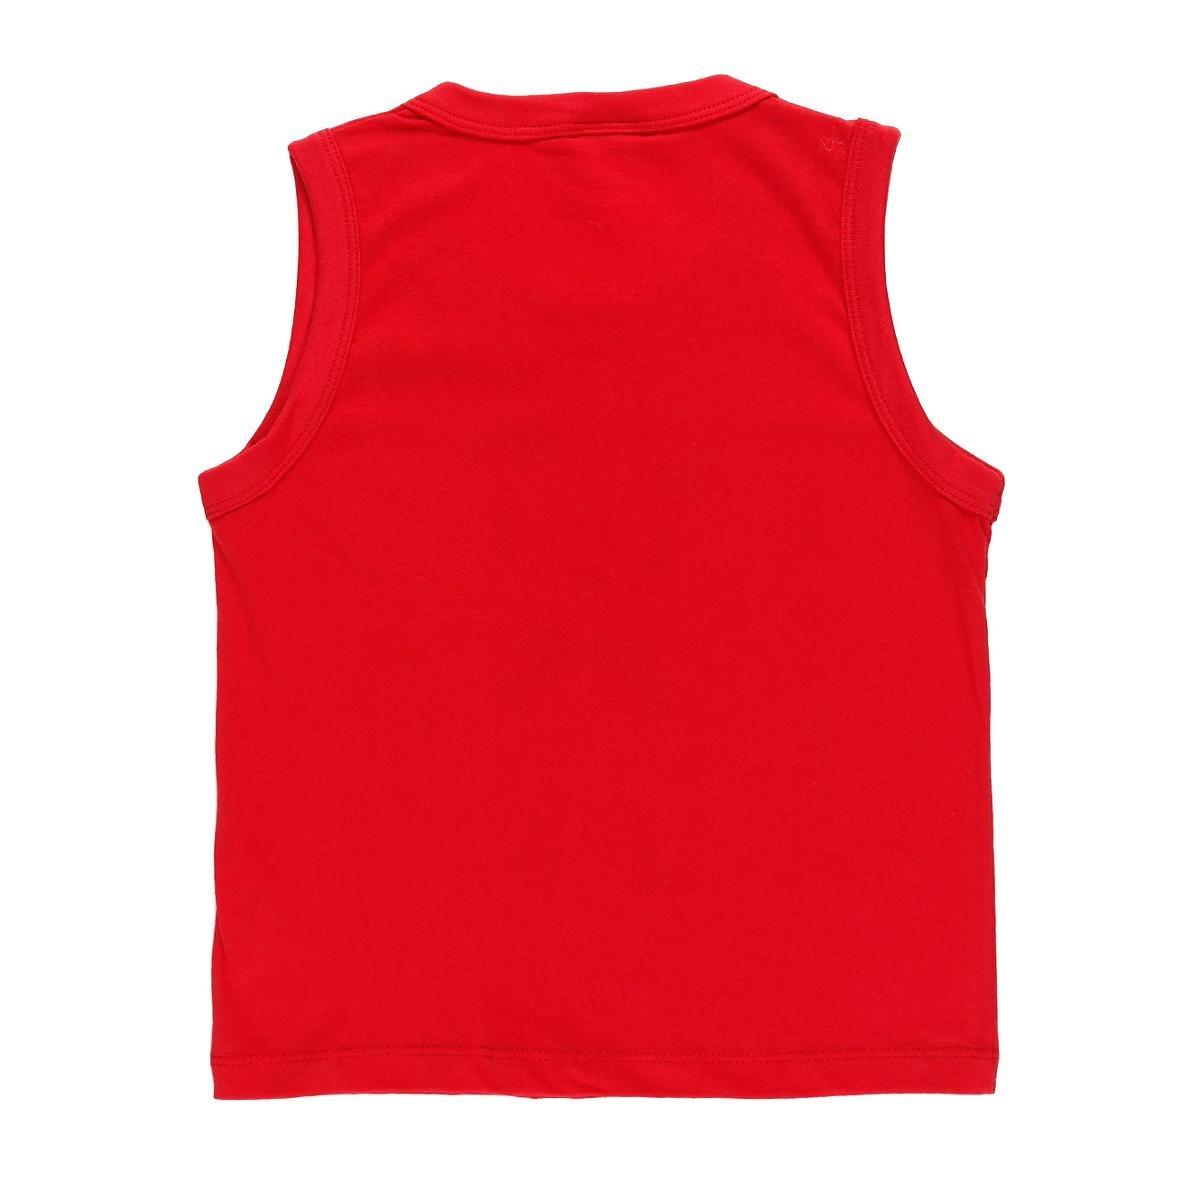 Camiseta Regata Infantil Disney Baby Masculina - Vermelho - Compre ... 61f976205c7b9